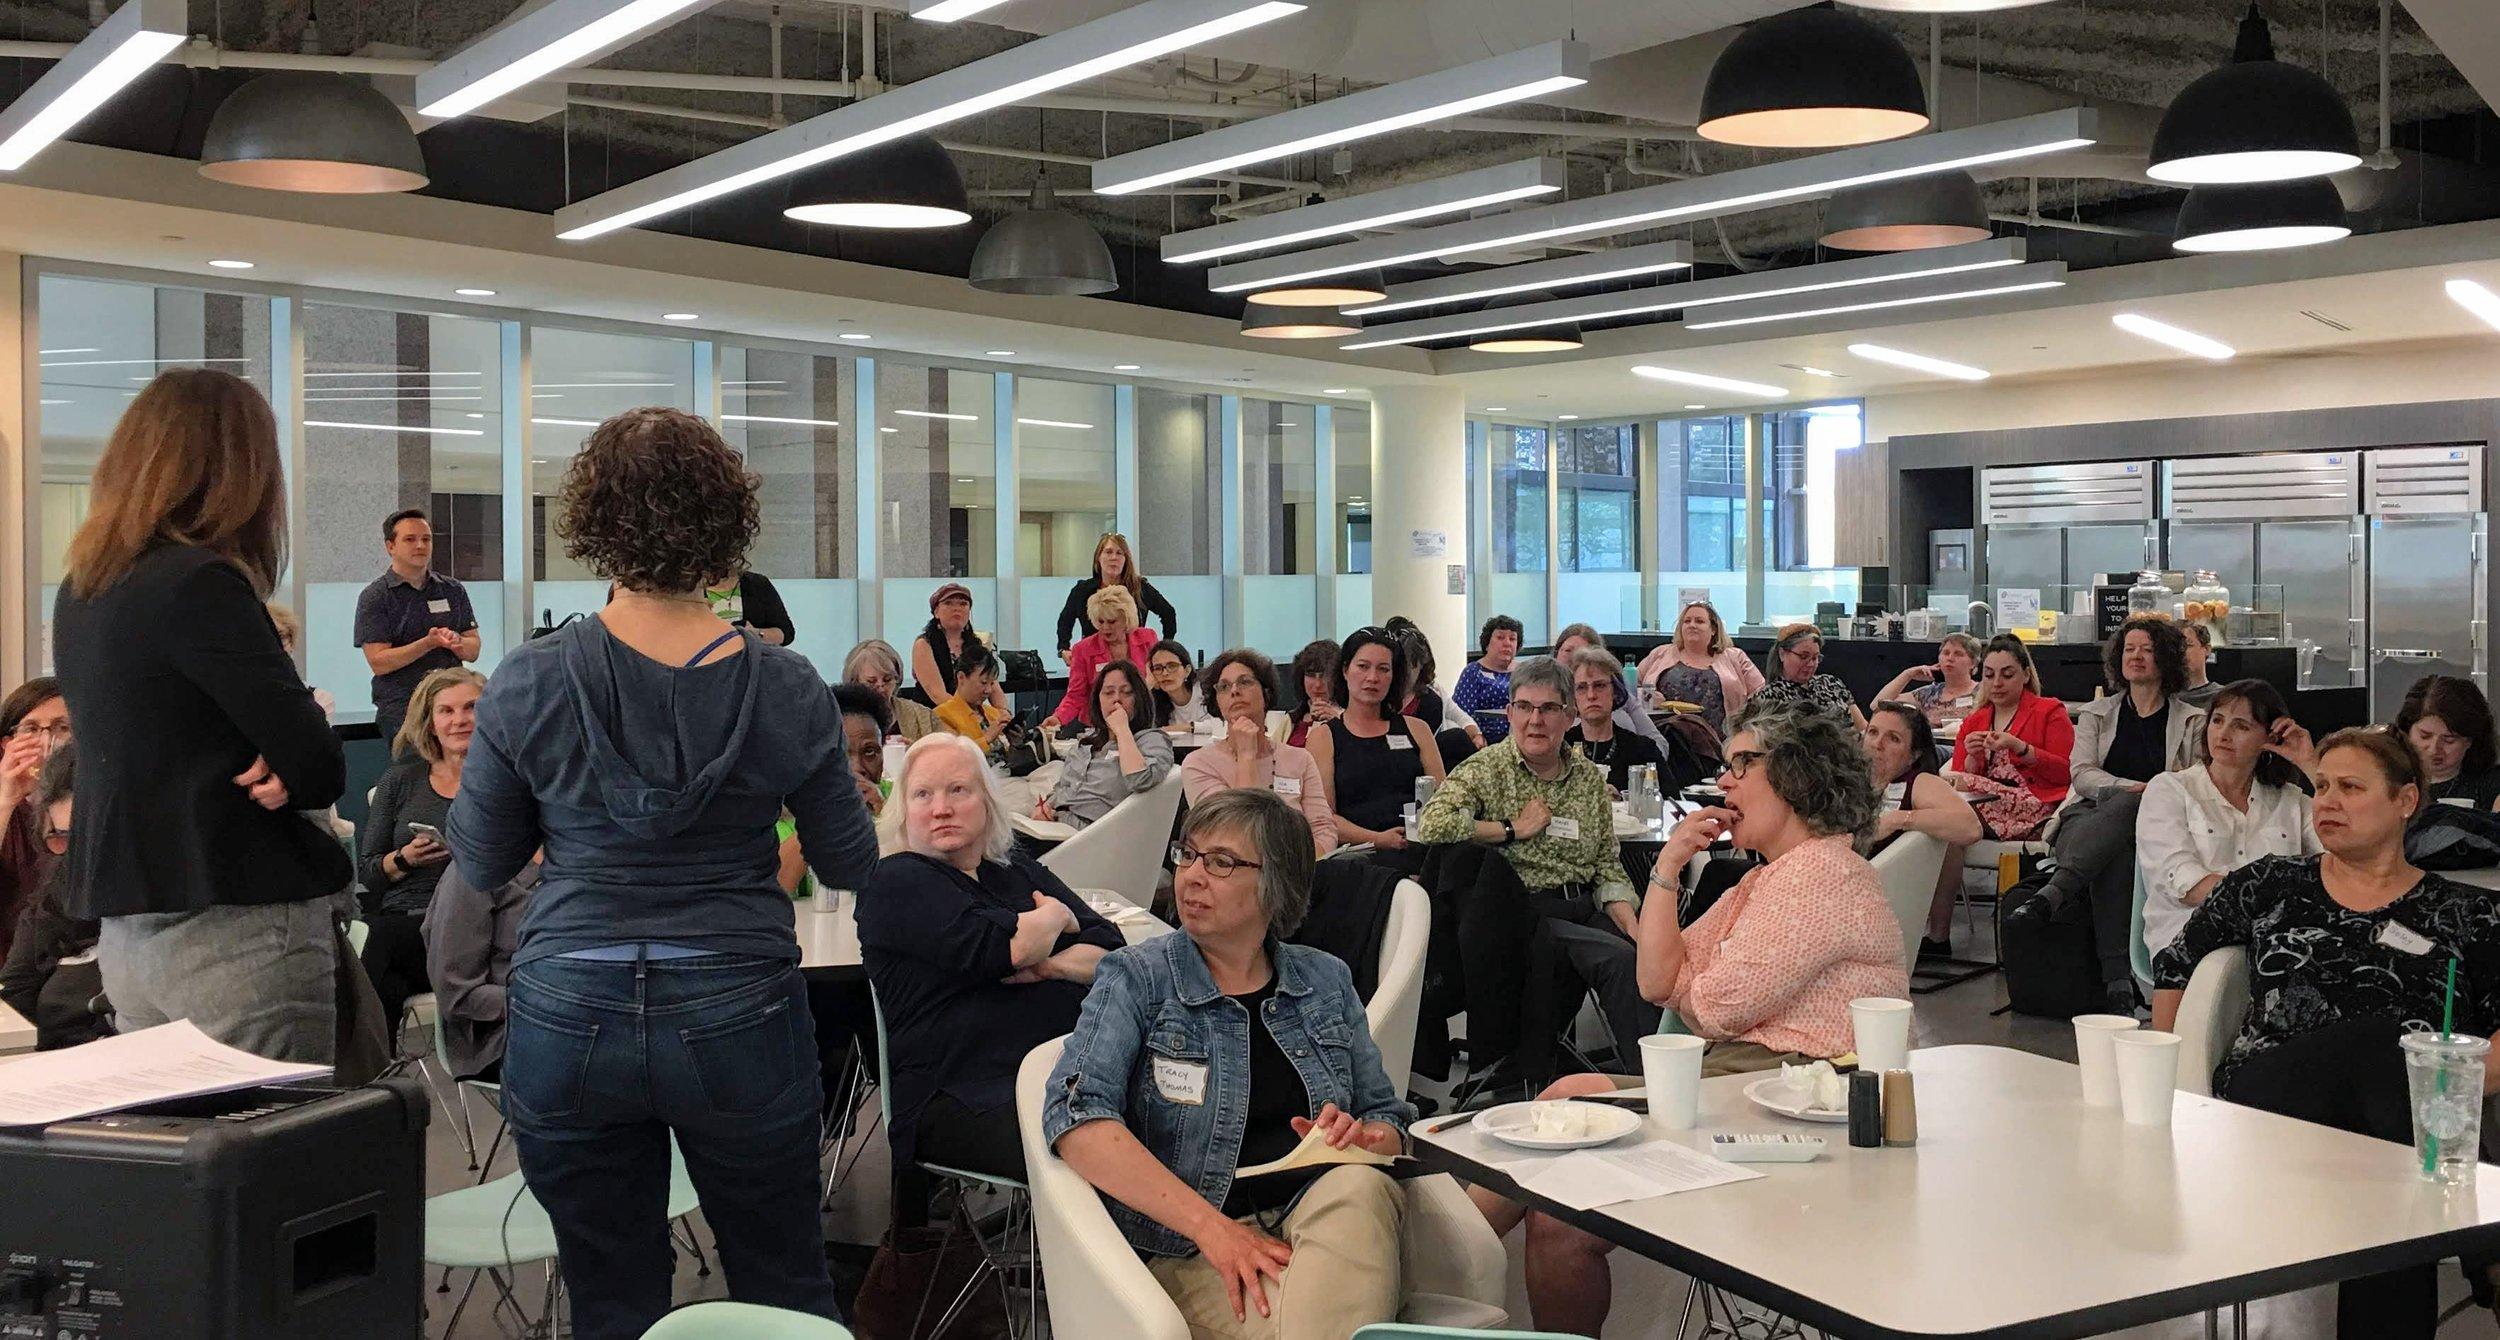 PDXWIT Experienced Women in Tech @ Corvel, 4/30/19 - Speakers present